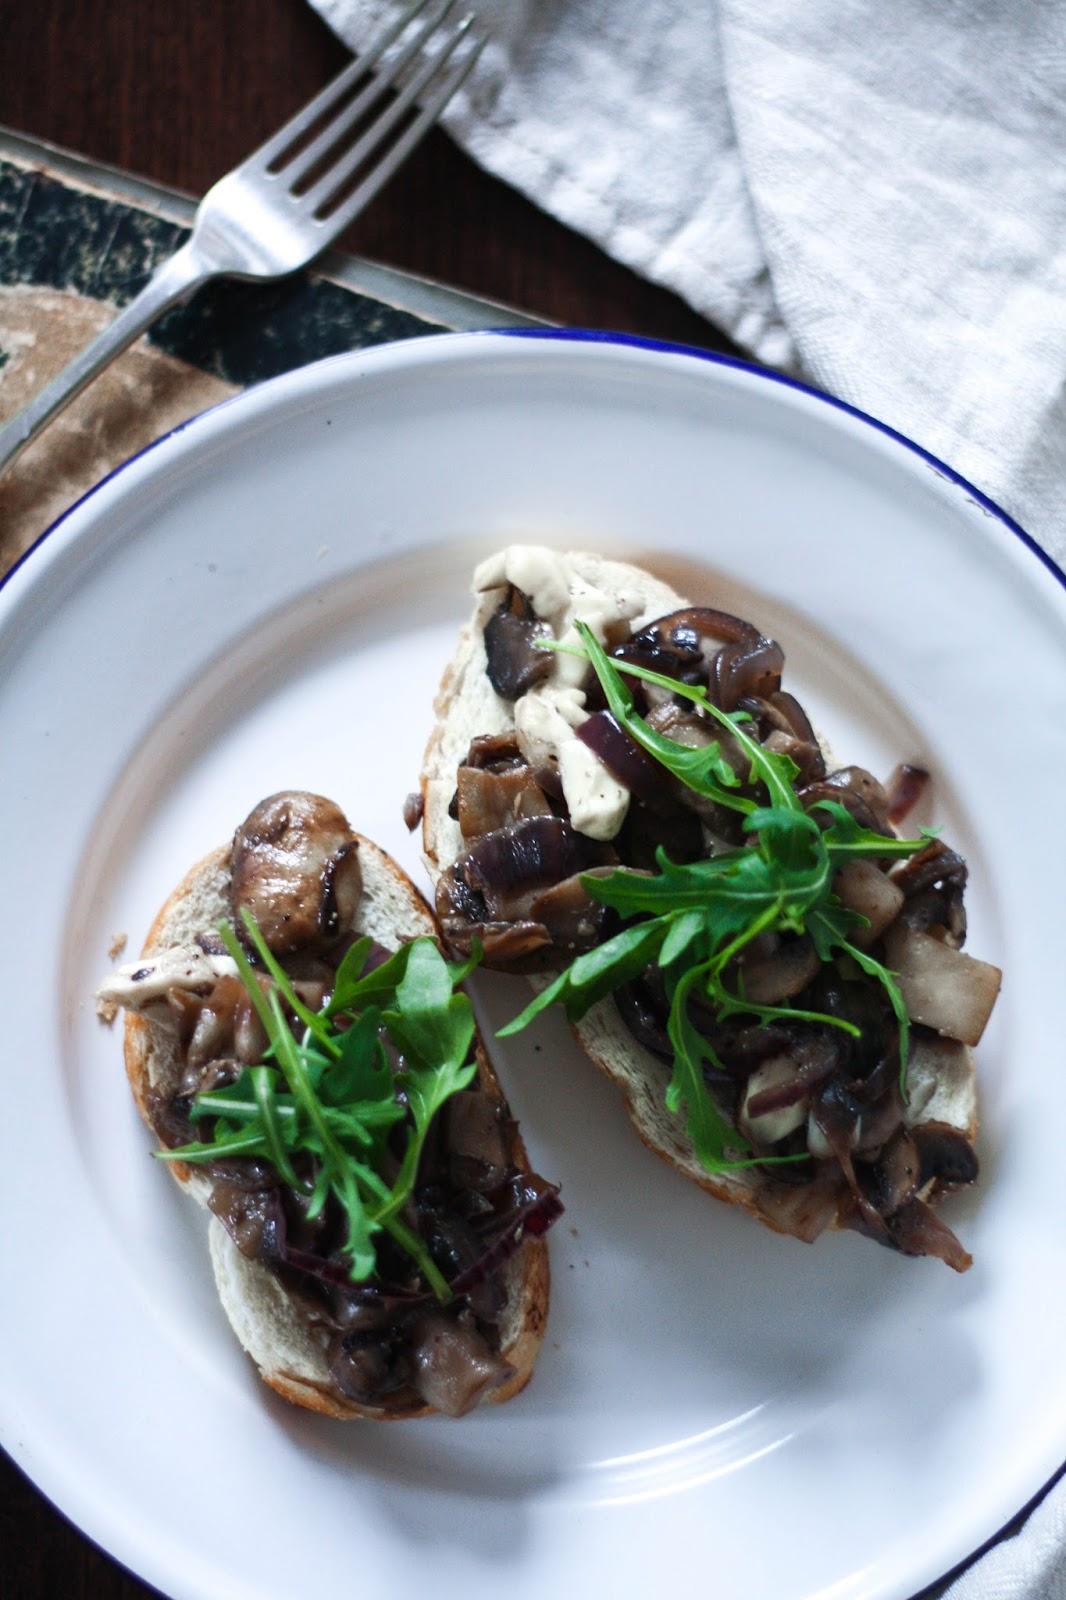 The best mushroom melt on toast you've ever tried